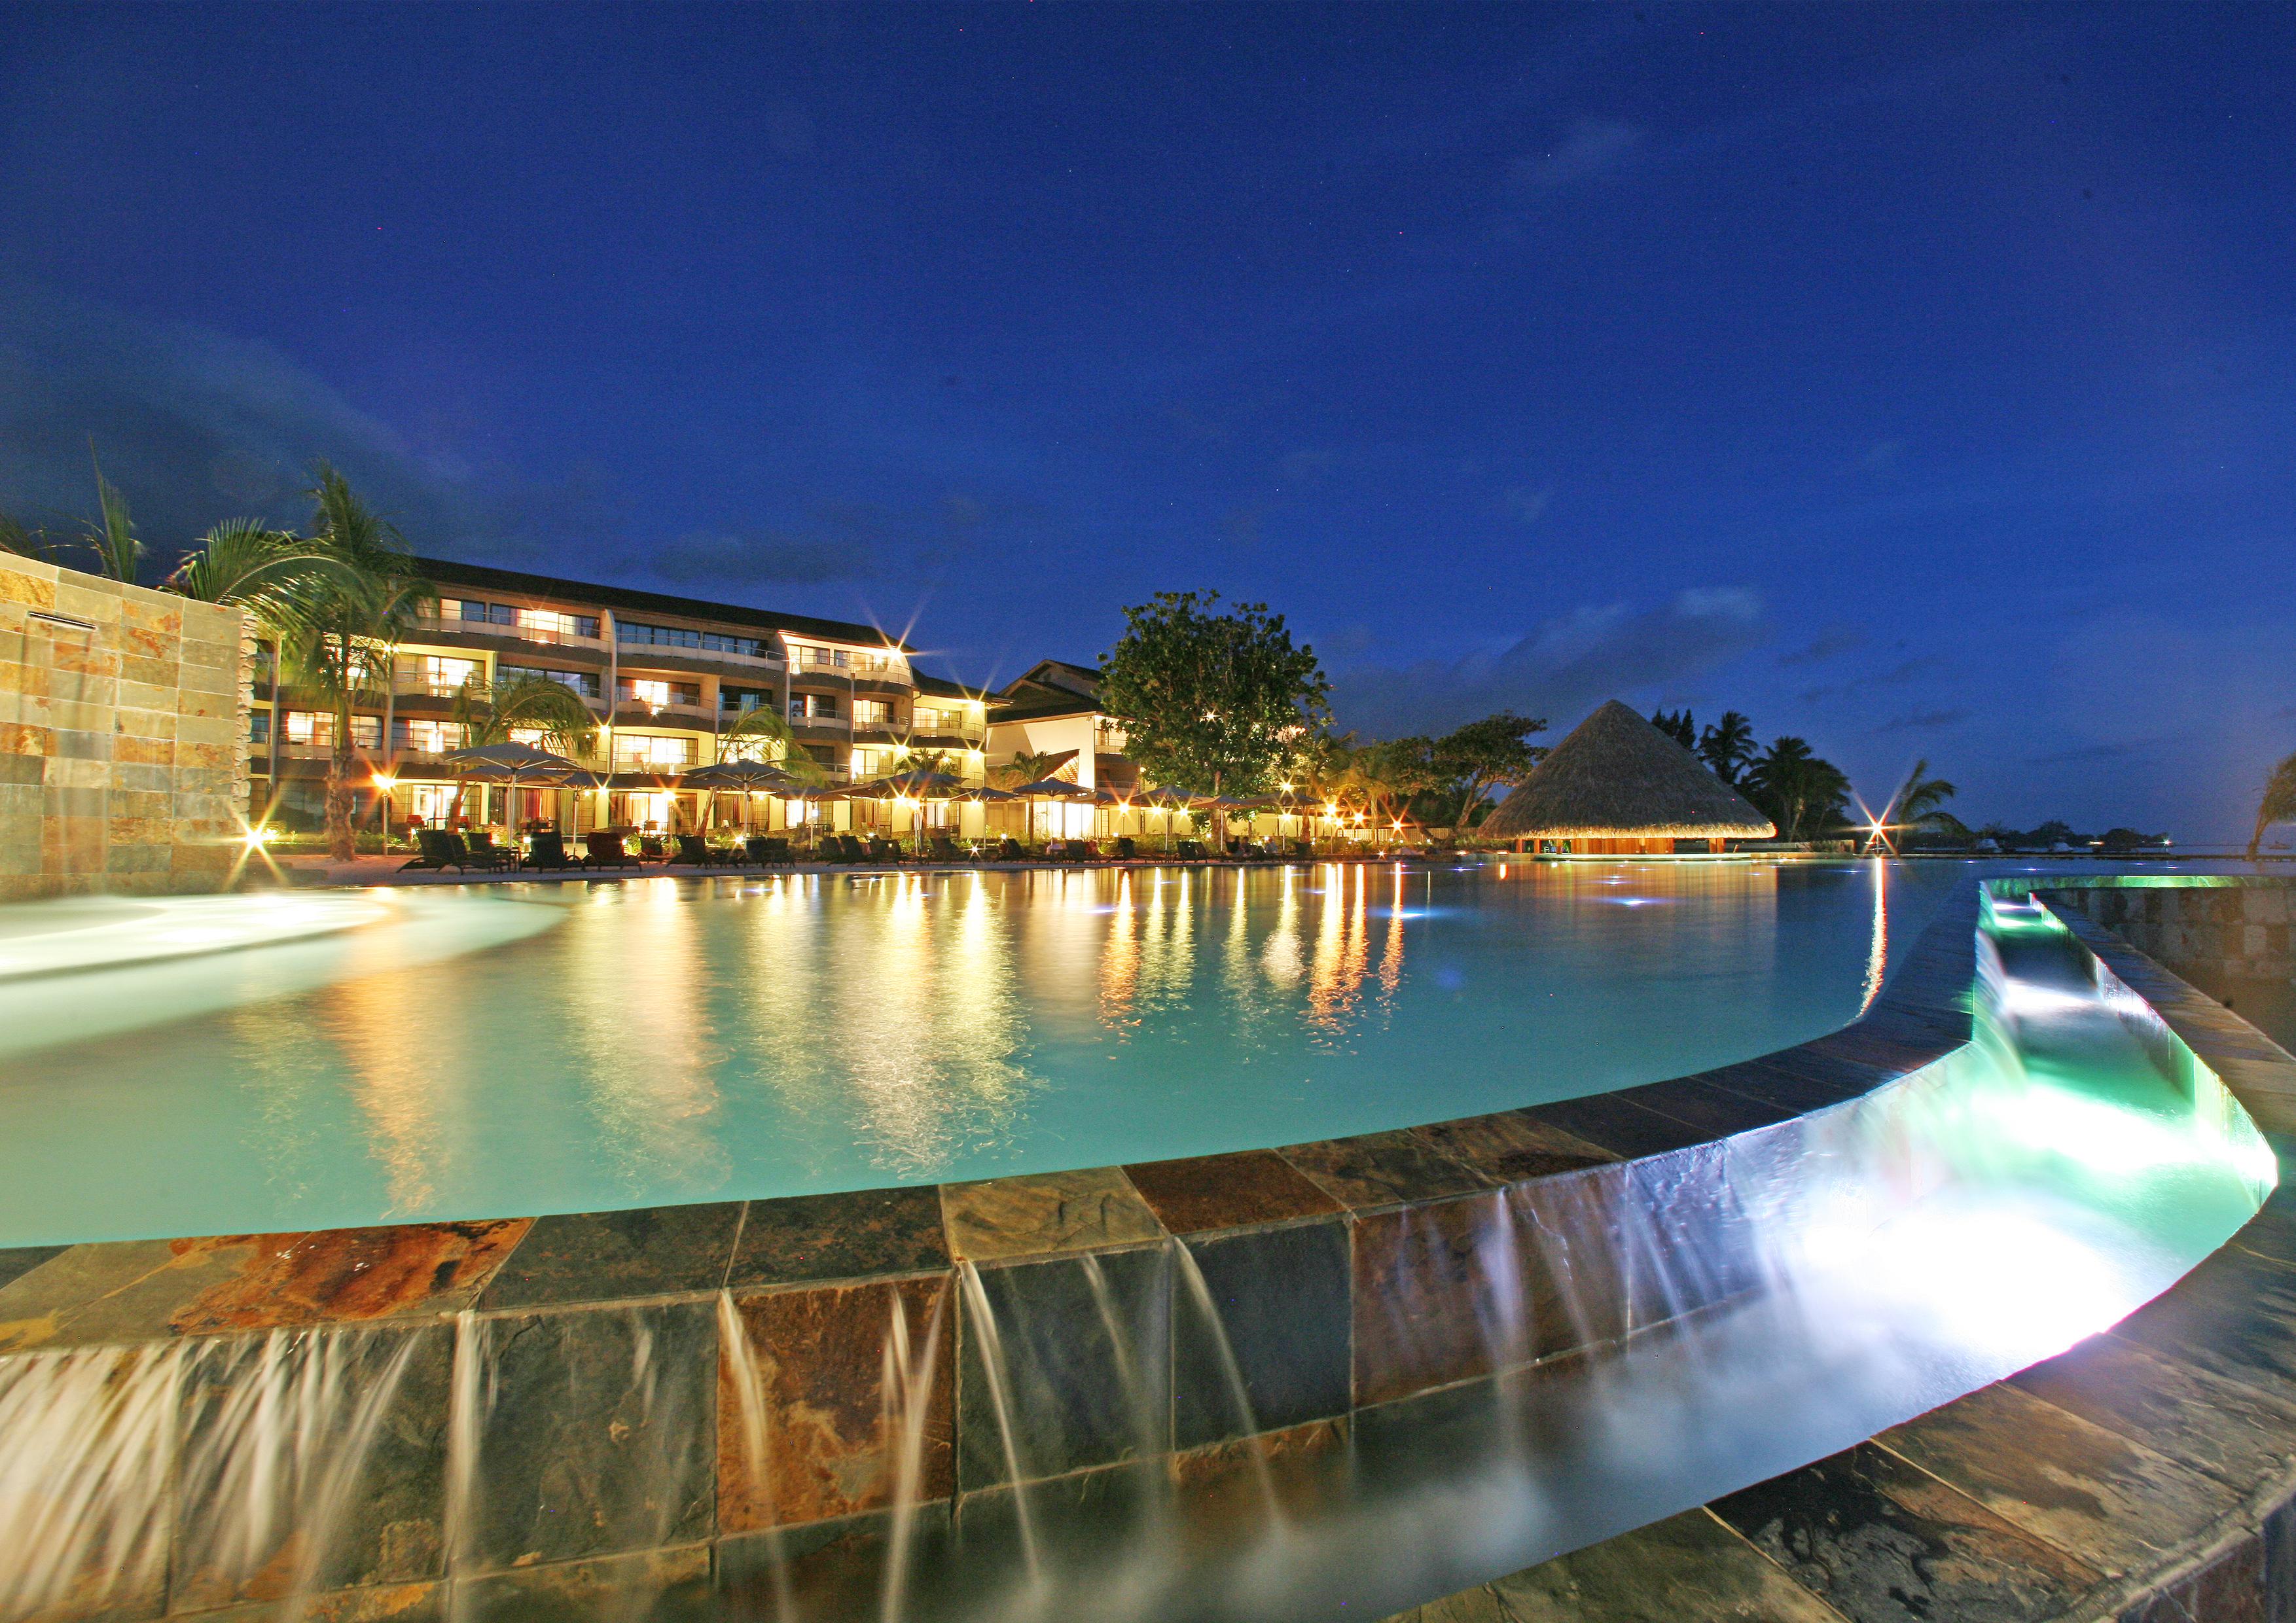 https://tahititourisme.de/wp-content/uploads/2017/08/HEBERGEMENT-Manava-Suite-Resort-Tahiti-1-®-GLB.jpg